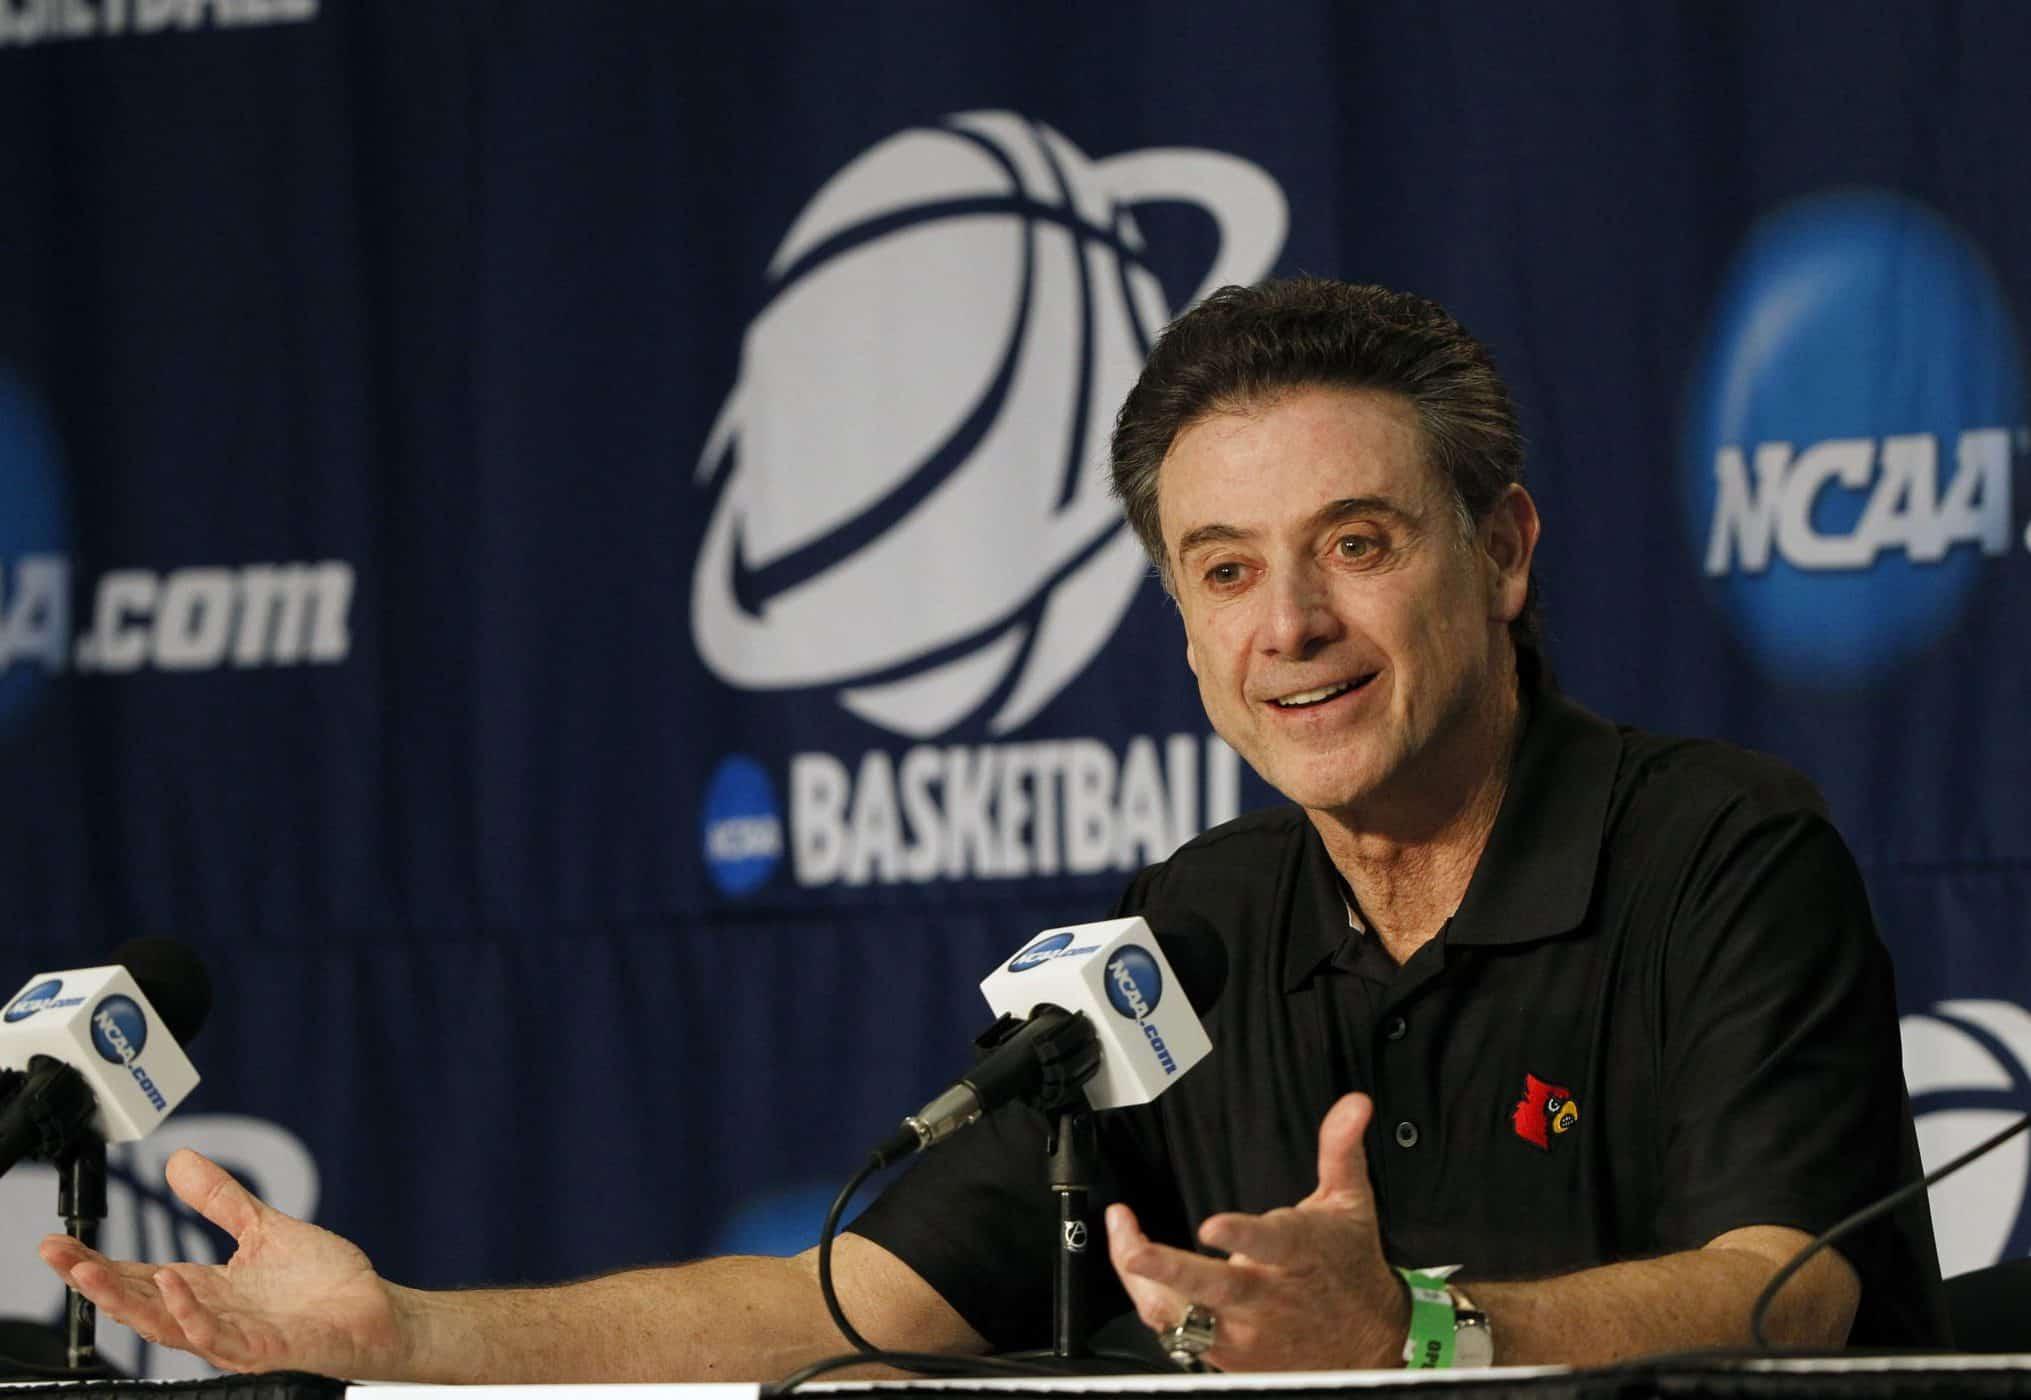 Ncaa Basketball: Rick Pitino (Louisville)